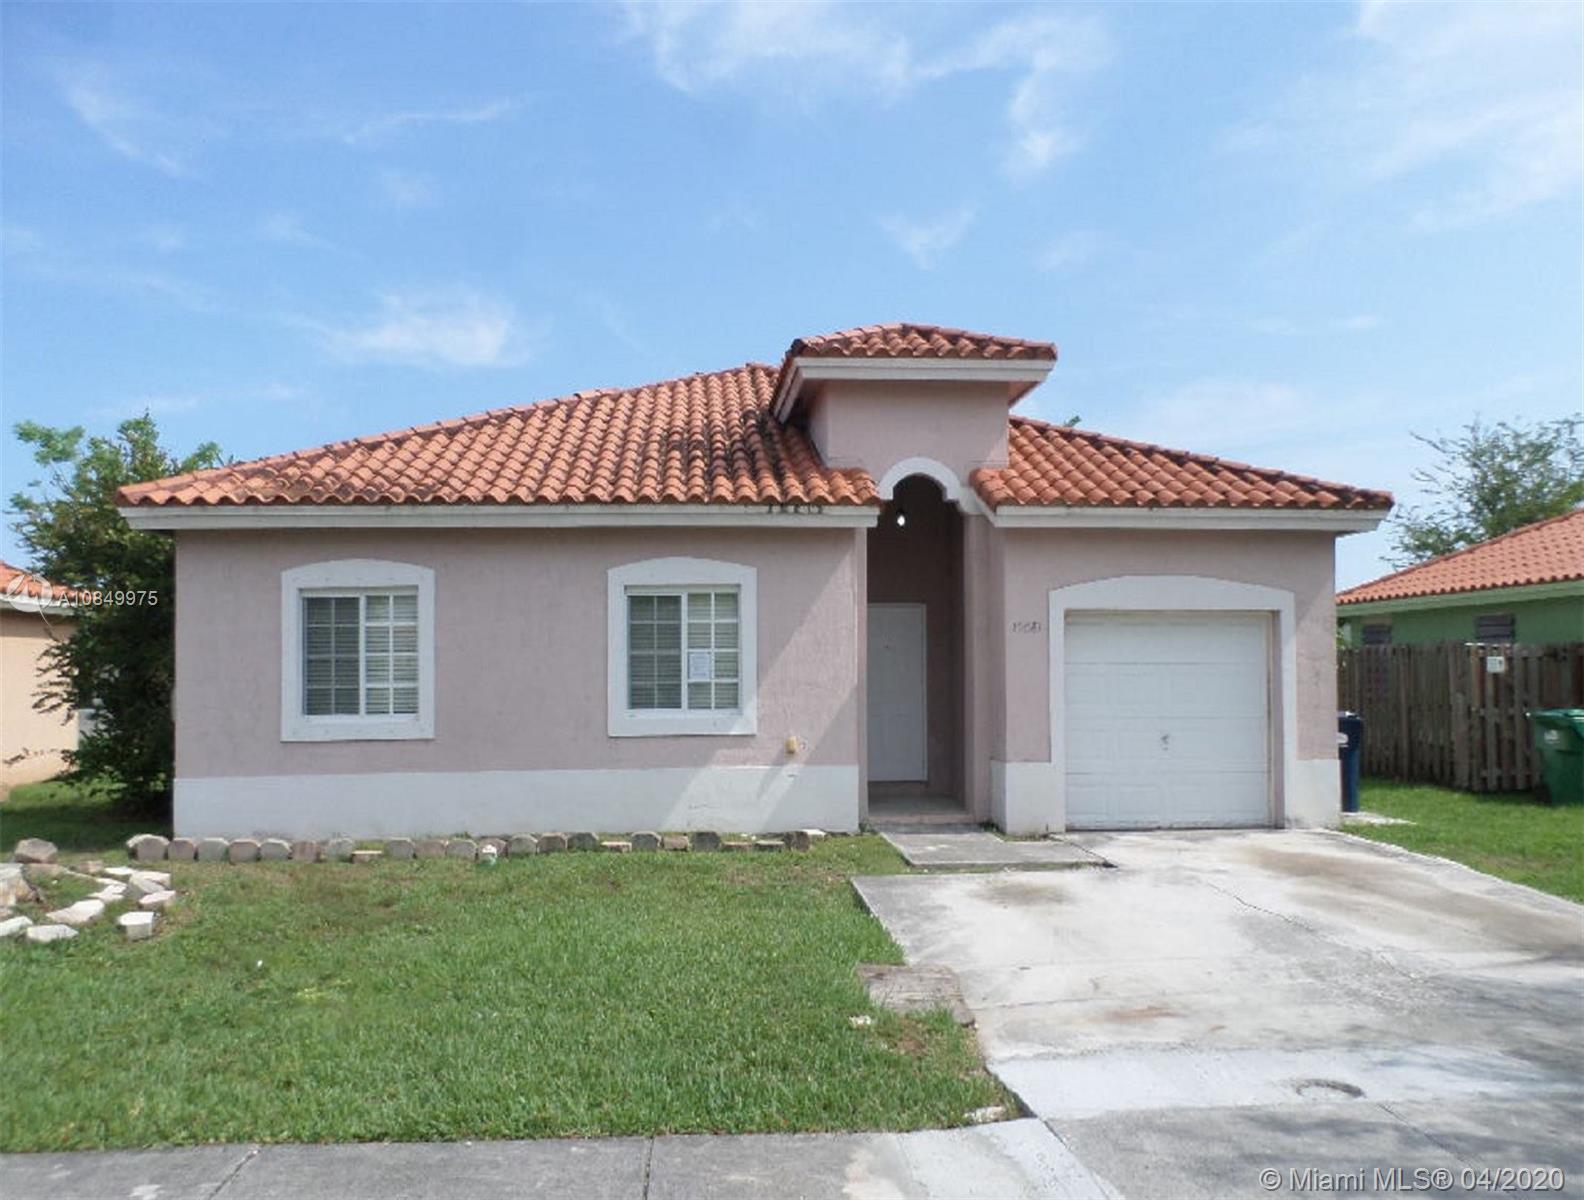 19081 SW 318th Ter, Homestead, FL 33030 - Homestead, FL real estate listing